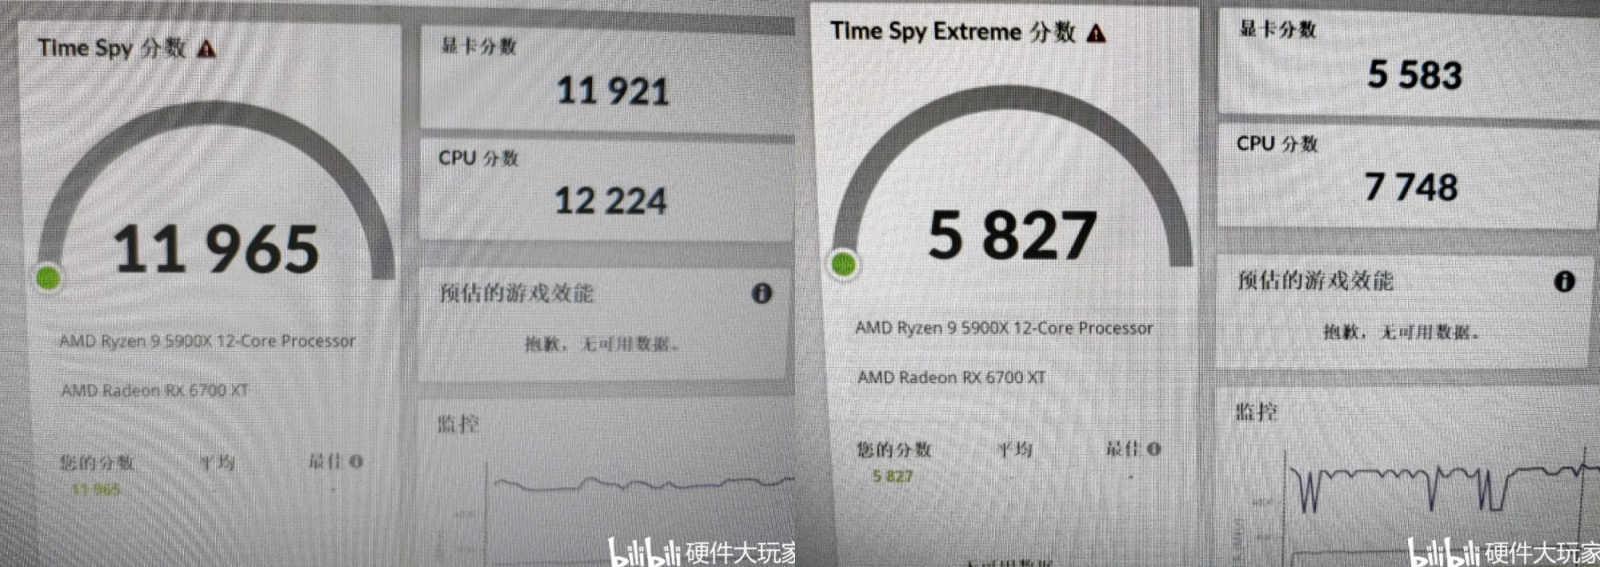 https://cdn.videocardz.com/1/2021/03/Sapphire-Radeon-RX-6700-XT-NITRO-3DMark-Time-Spy.jpg